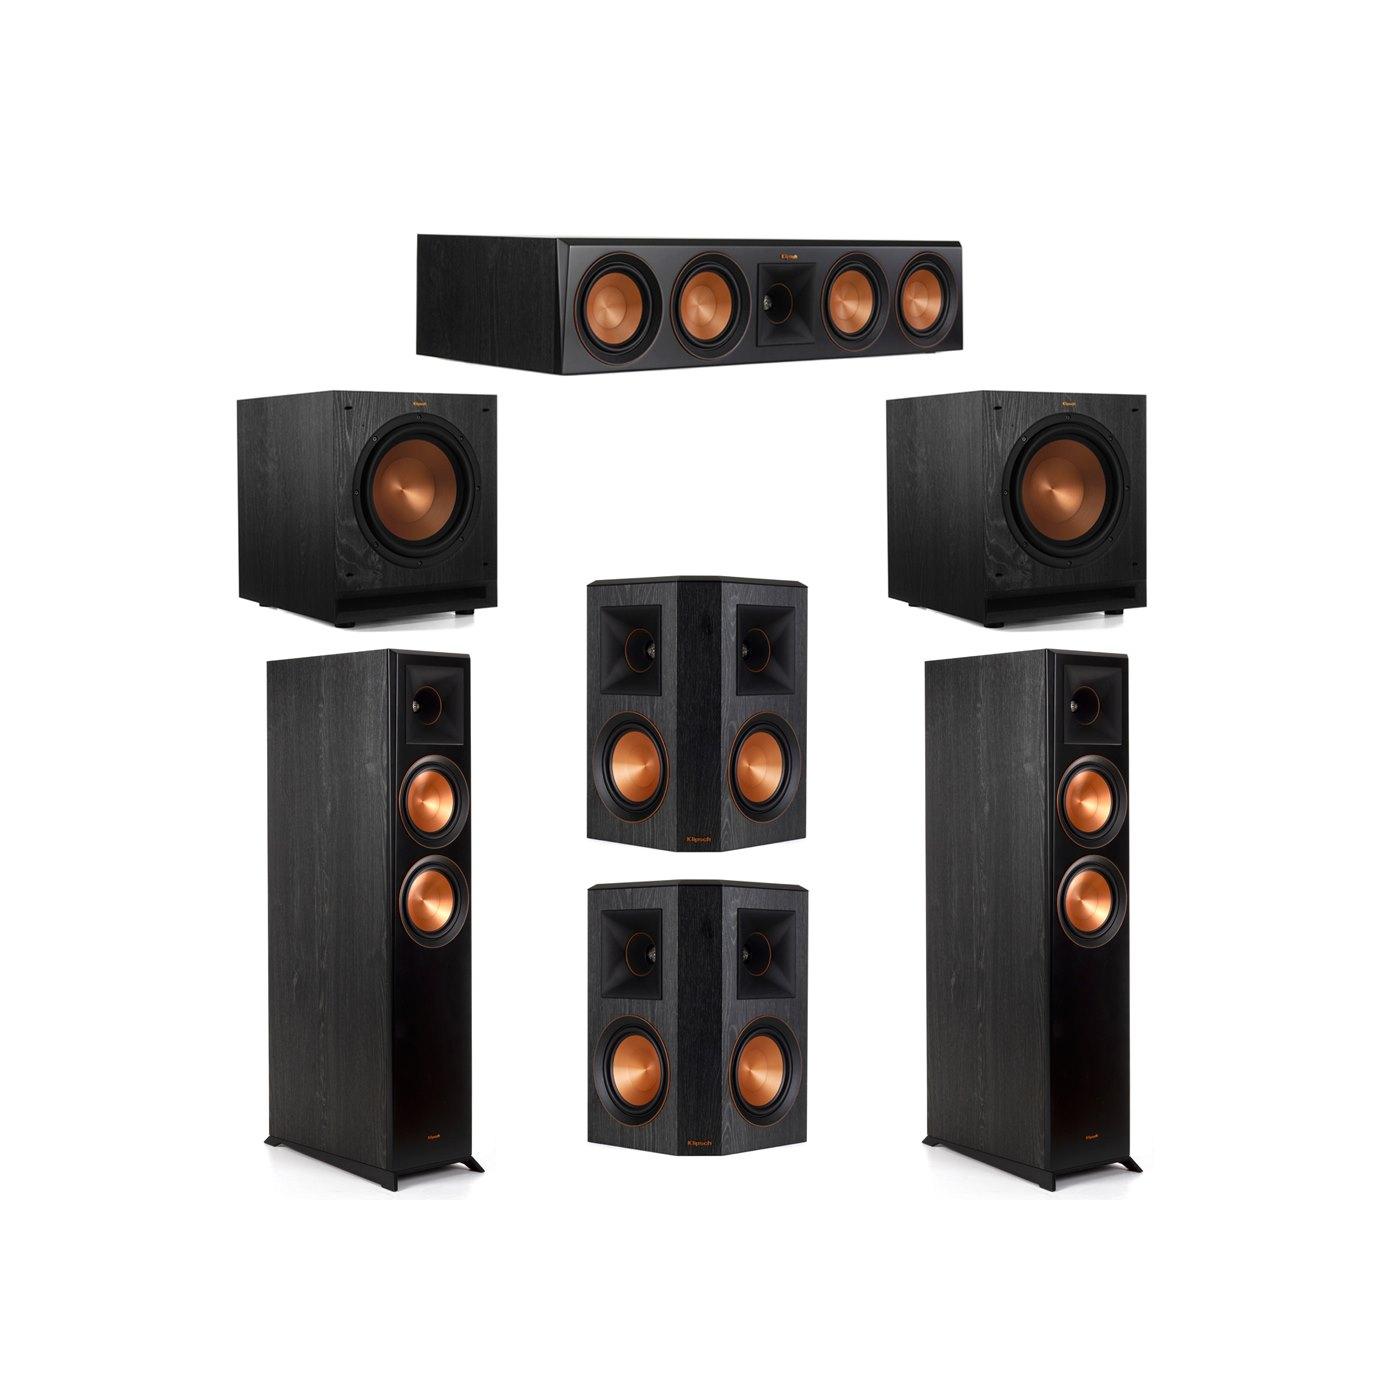 Klipsch 5.2 System with 2 RP-6000F Floorstanding Speakers, 1 Klipsch RP-504C Center Speaker, 2 Klipsch RP-502S Surround Speakers, 2 Klipsch SPL-100 Subwoofers